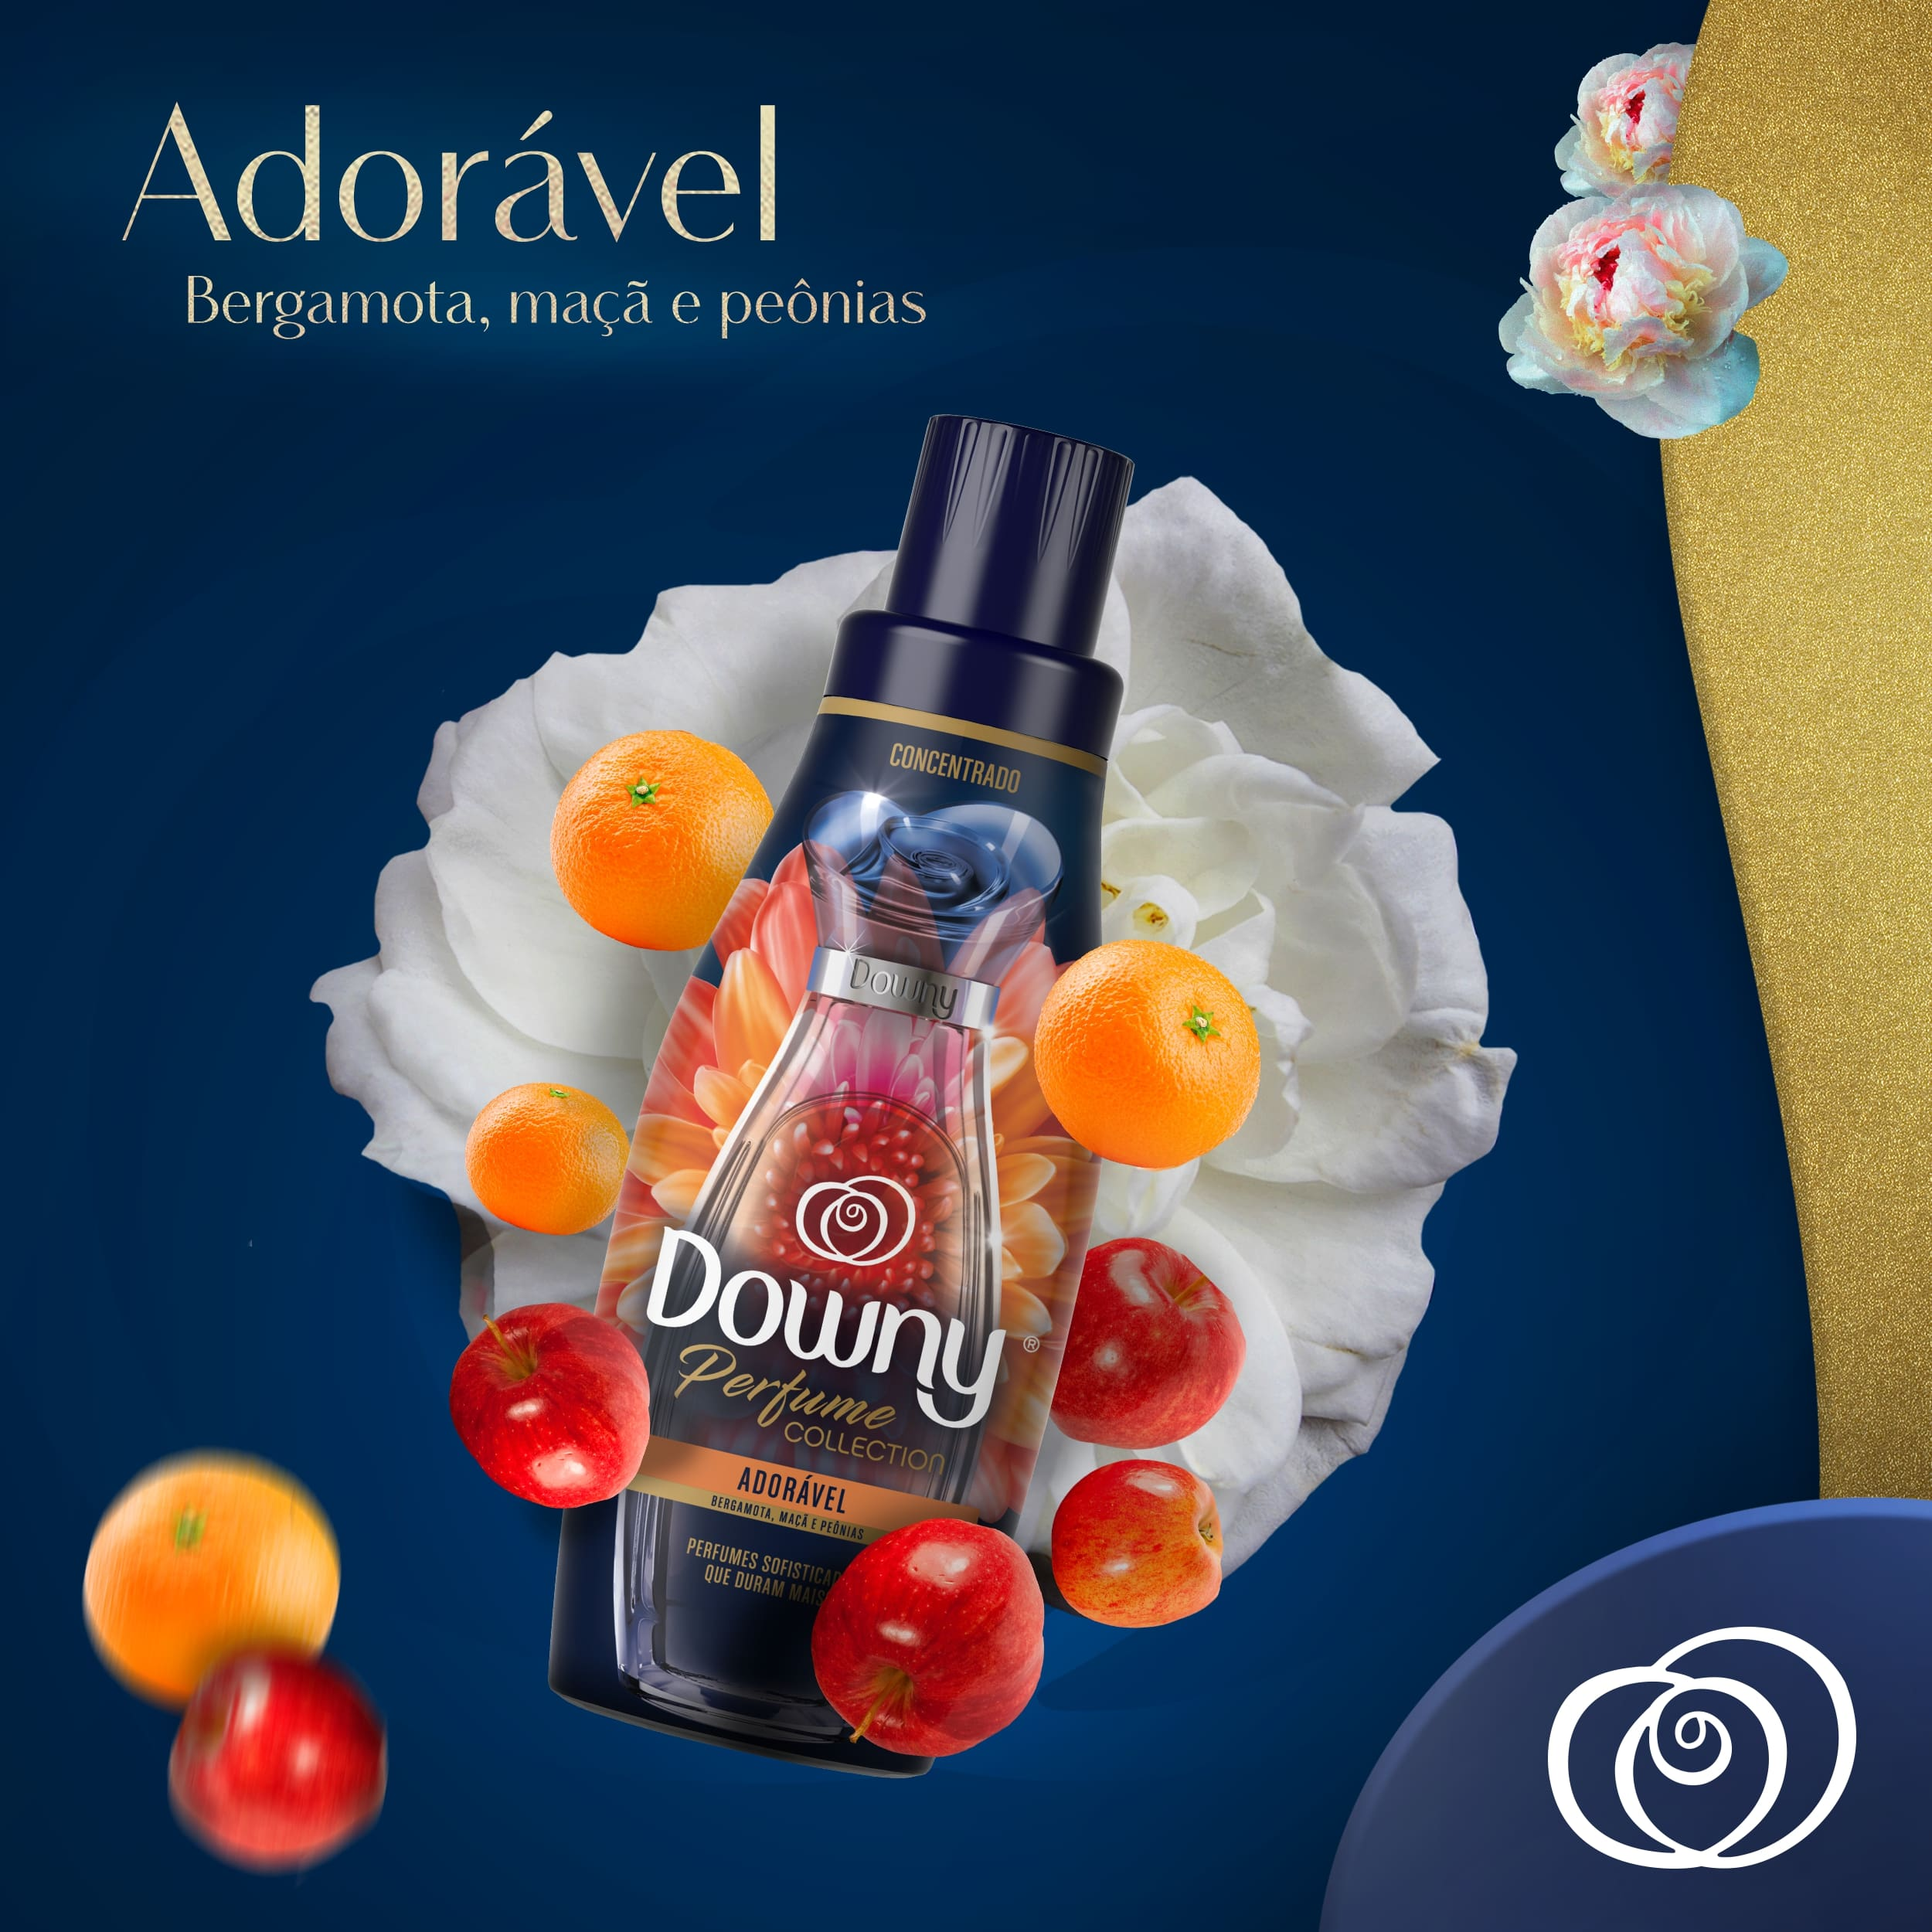 Amaciante Downy Perfume Collection Adorável Secondary 02